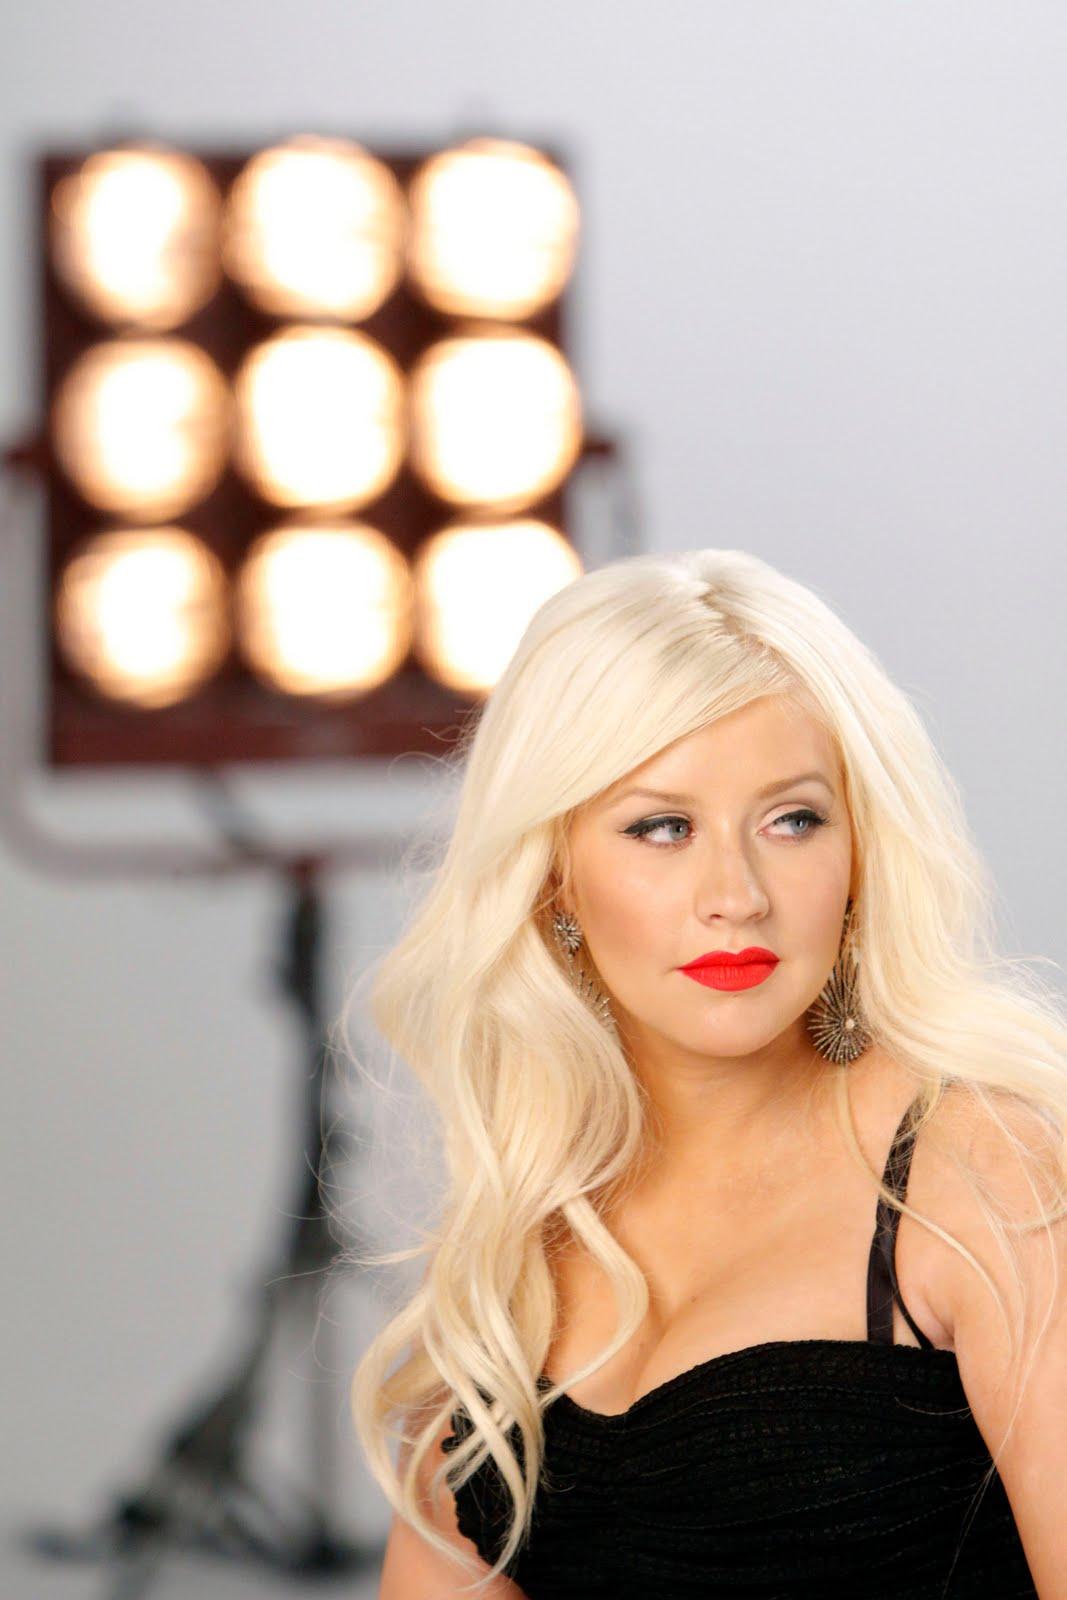 Christina Aguilera Body: Christina Aguilera The Voice Christina